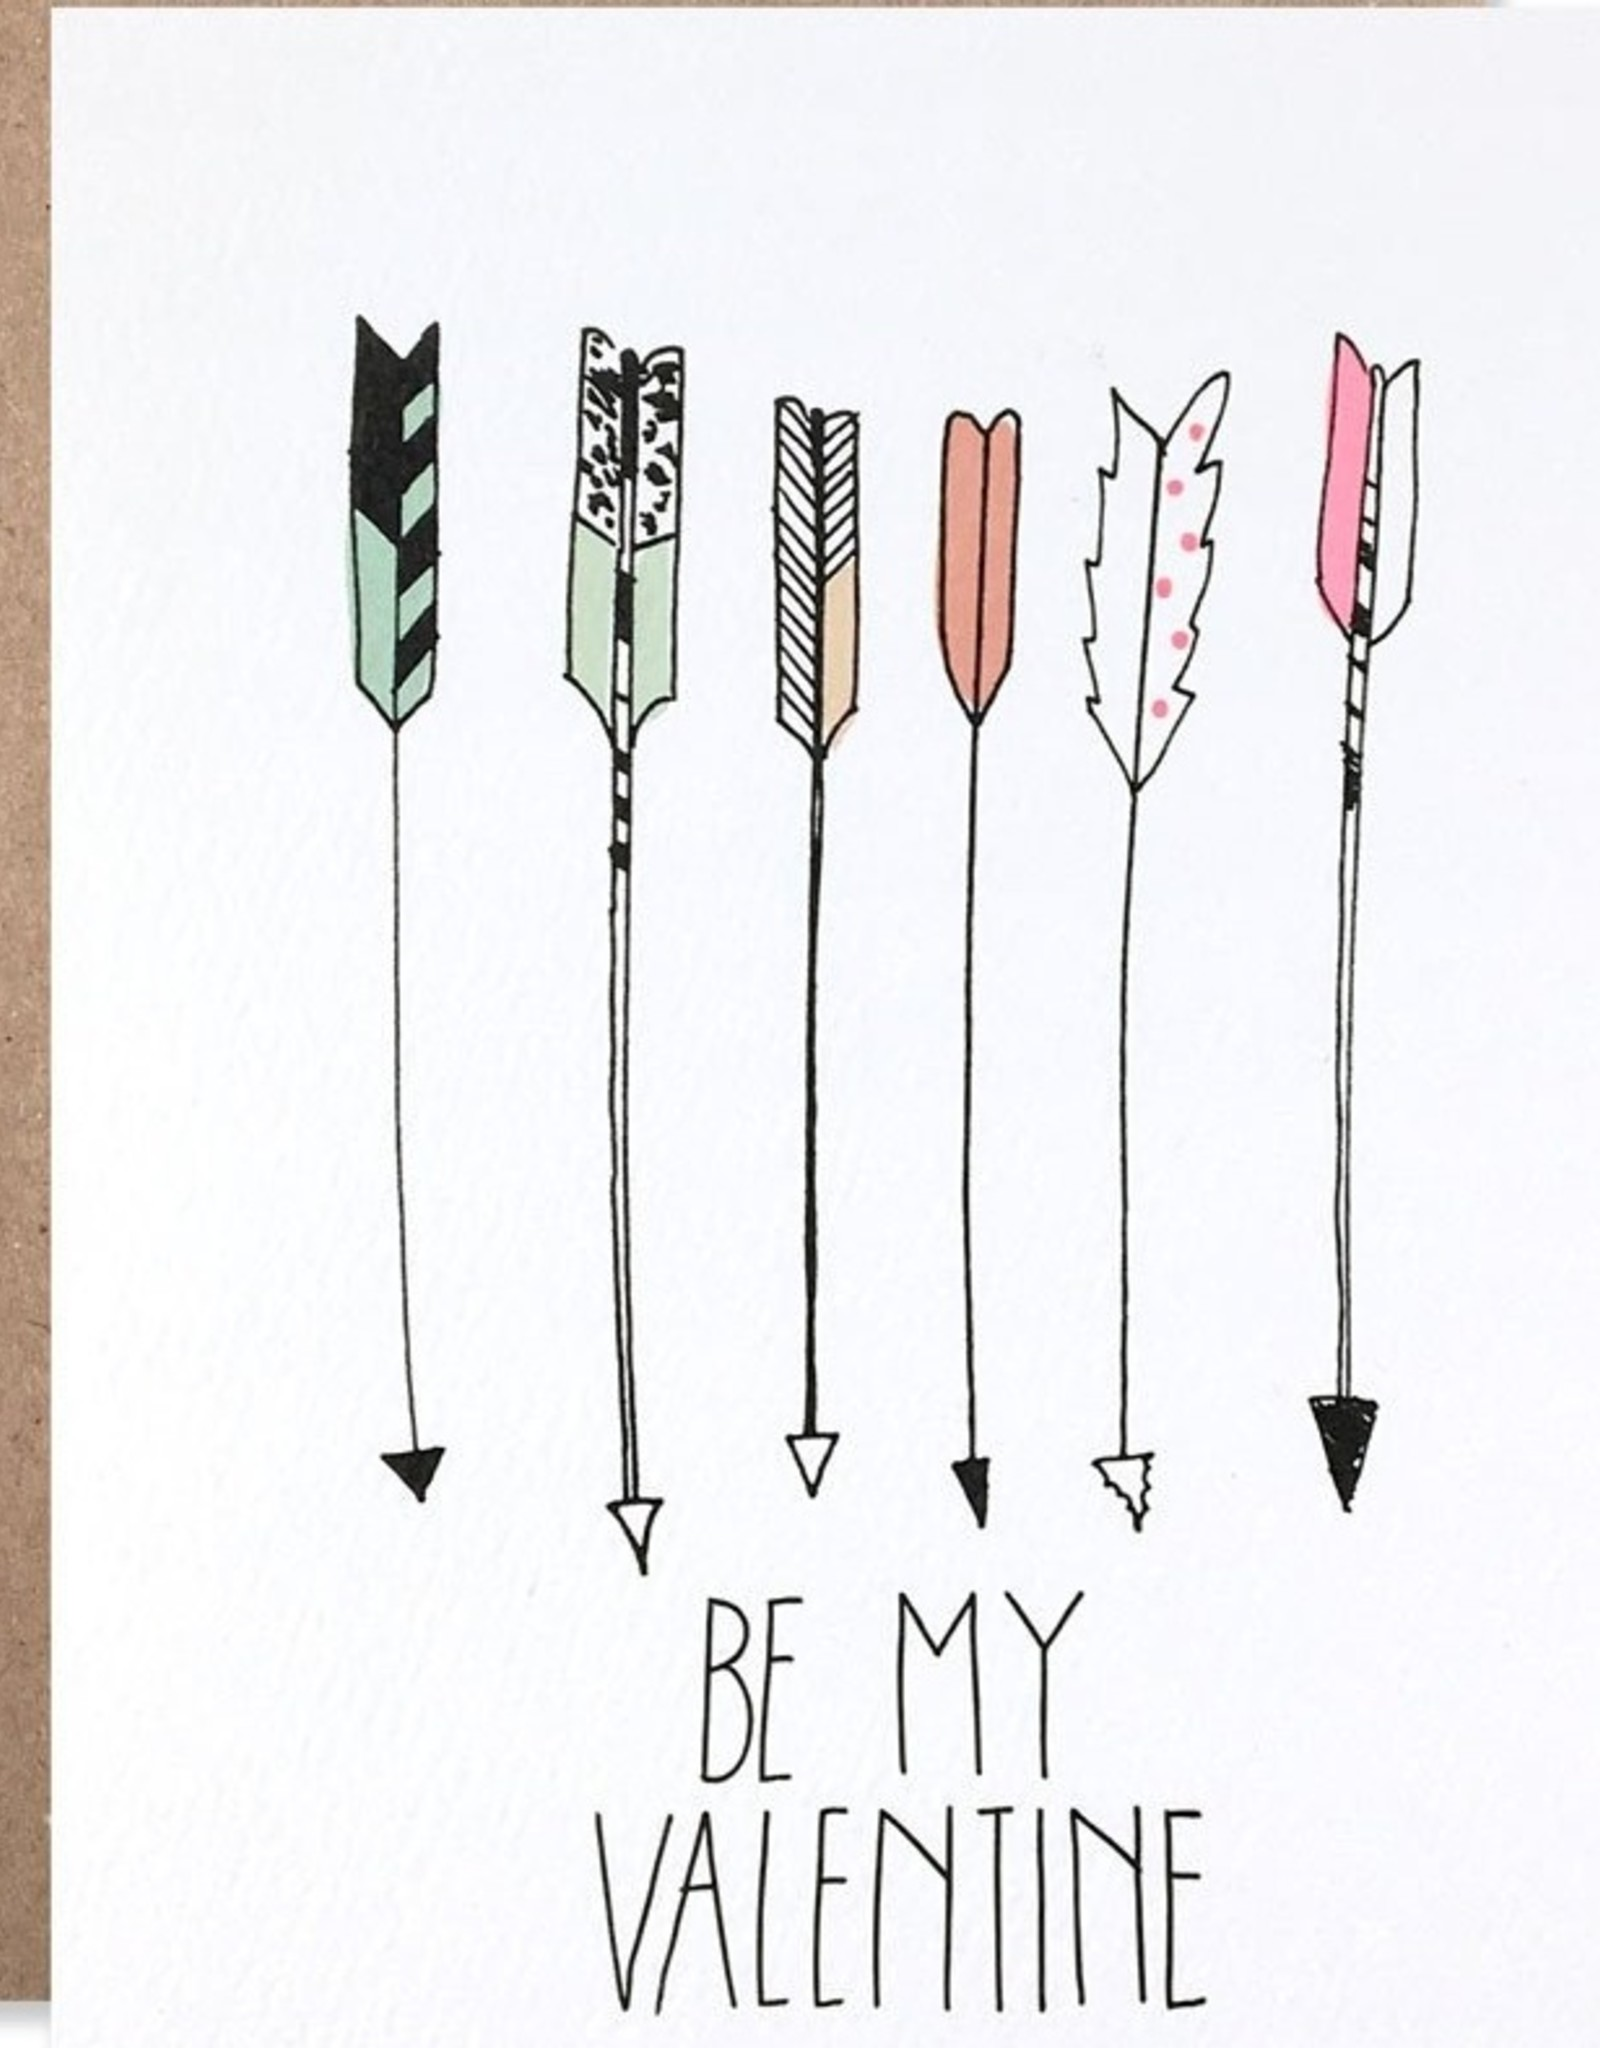 Hartland Brooklyn Card - Love: Be my valentine arrows